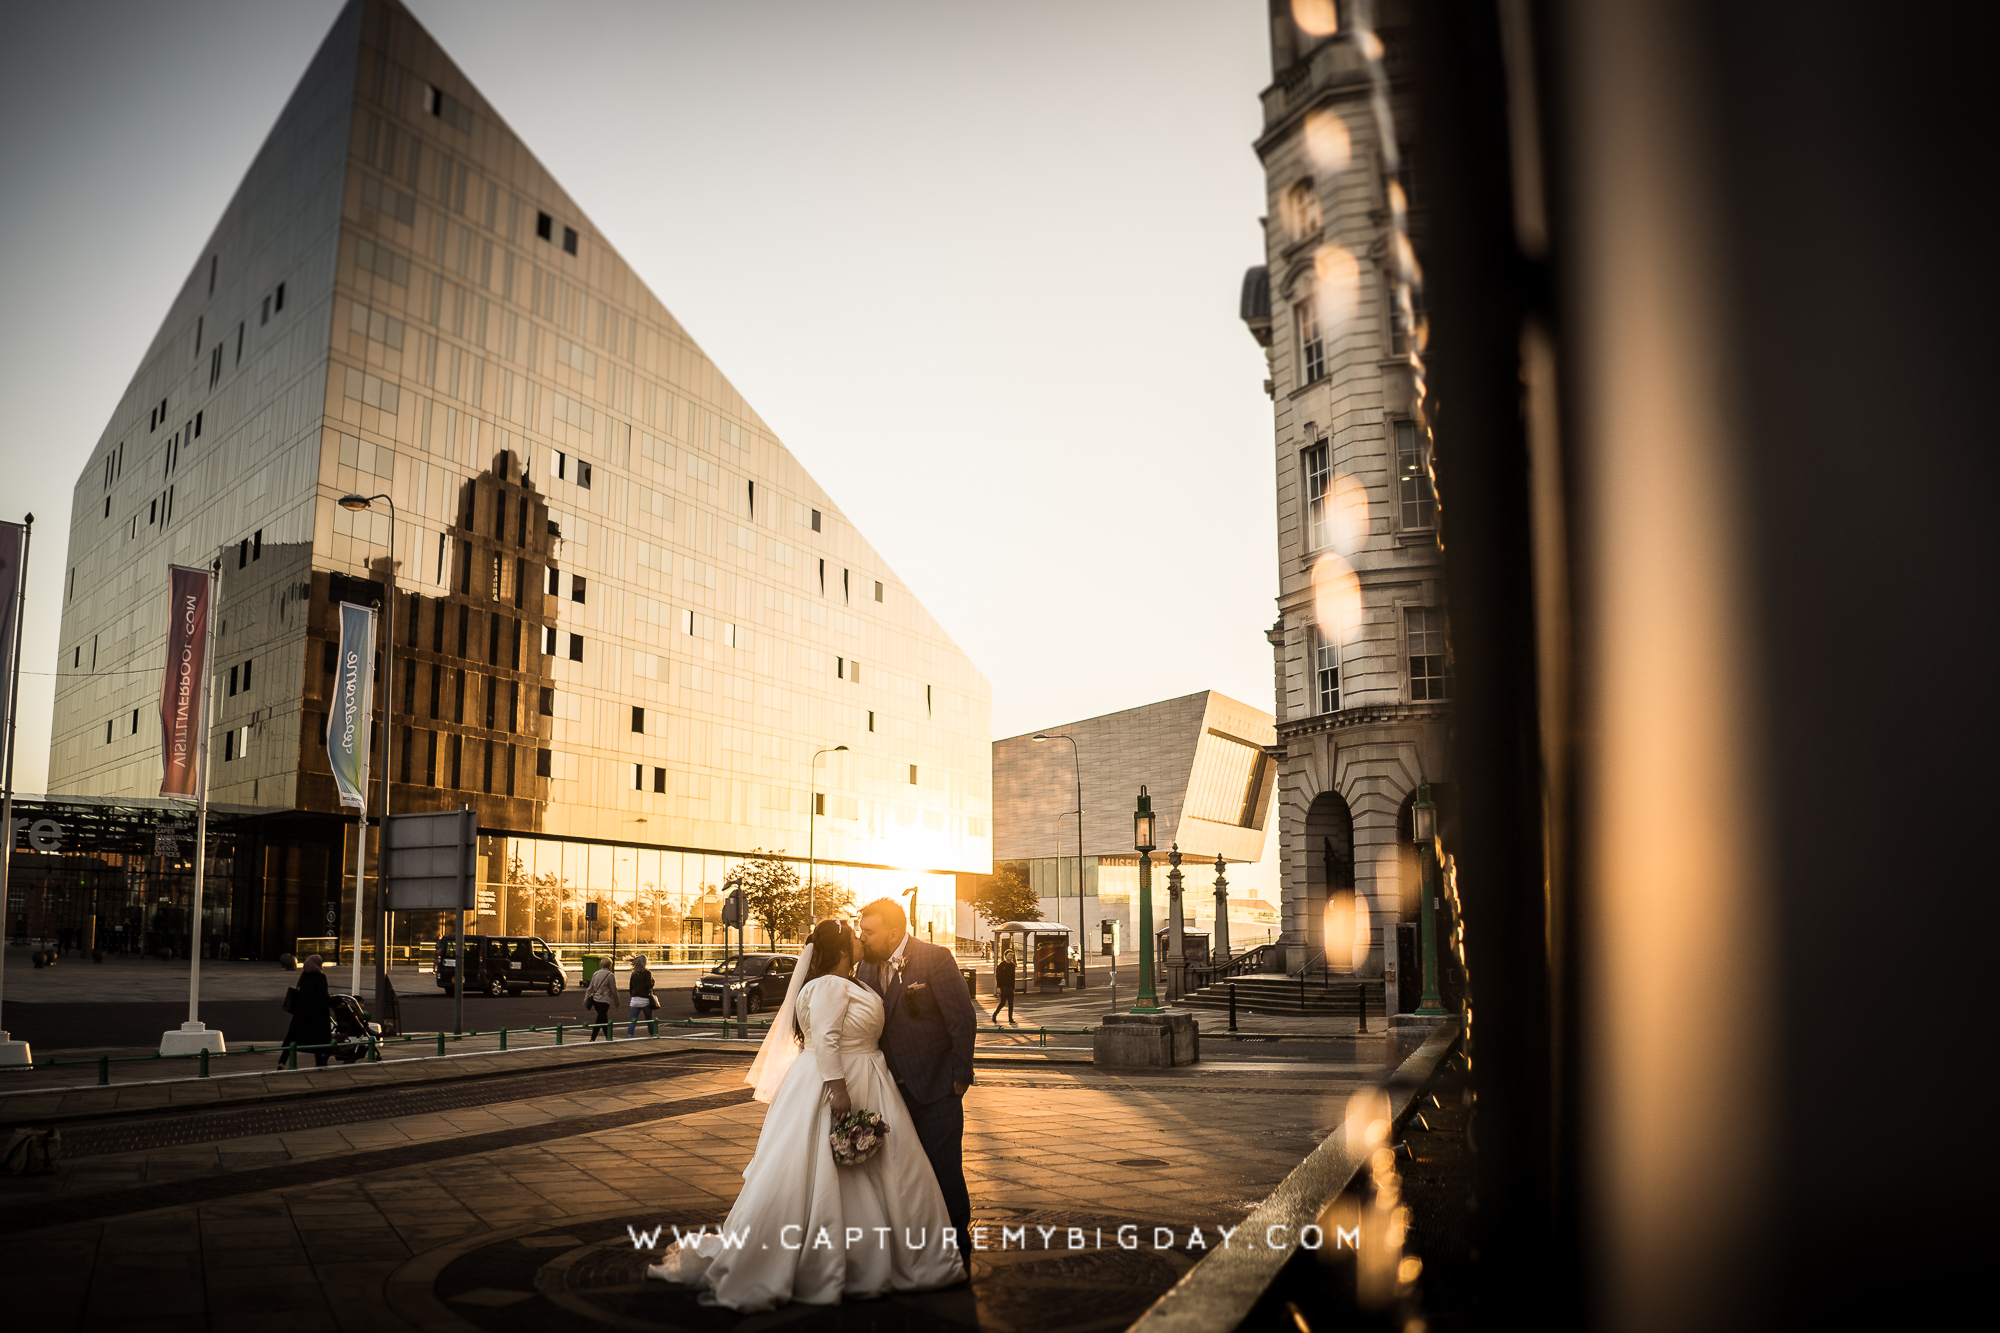 sunset wedding photograph liverpool